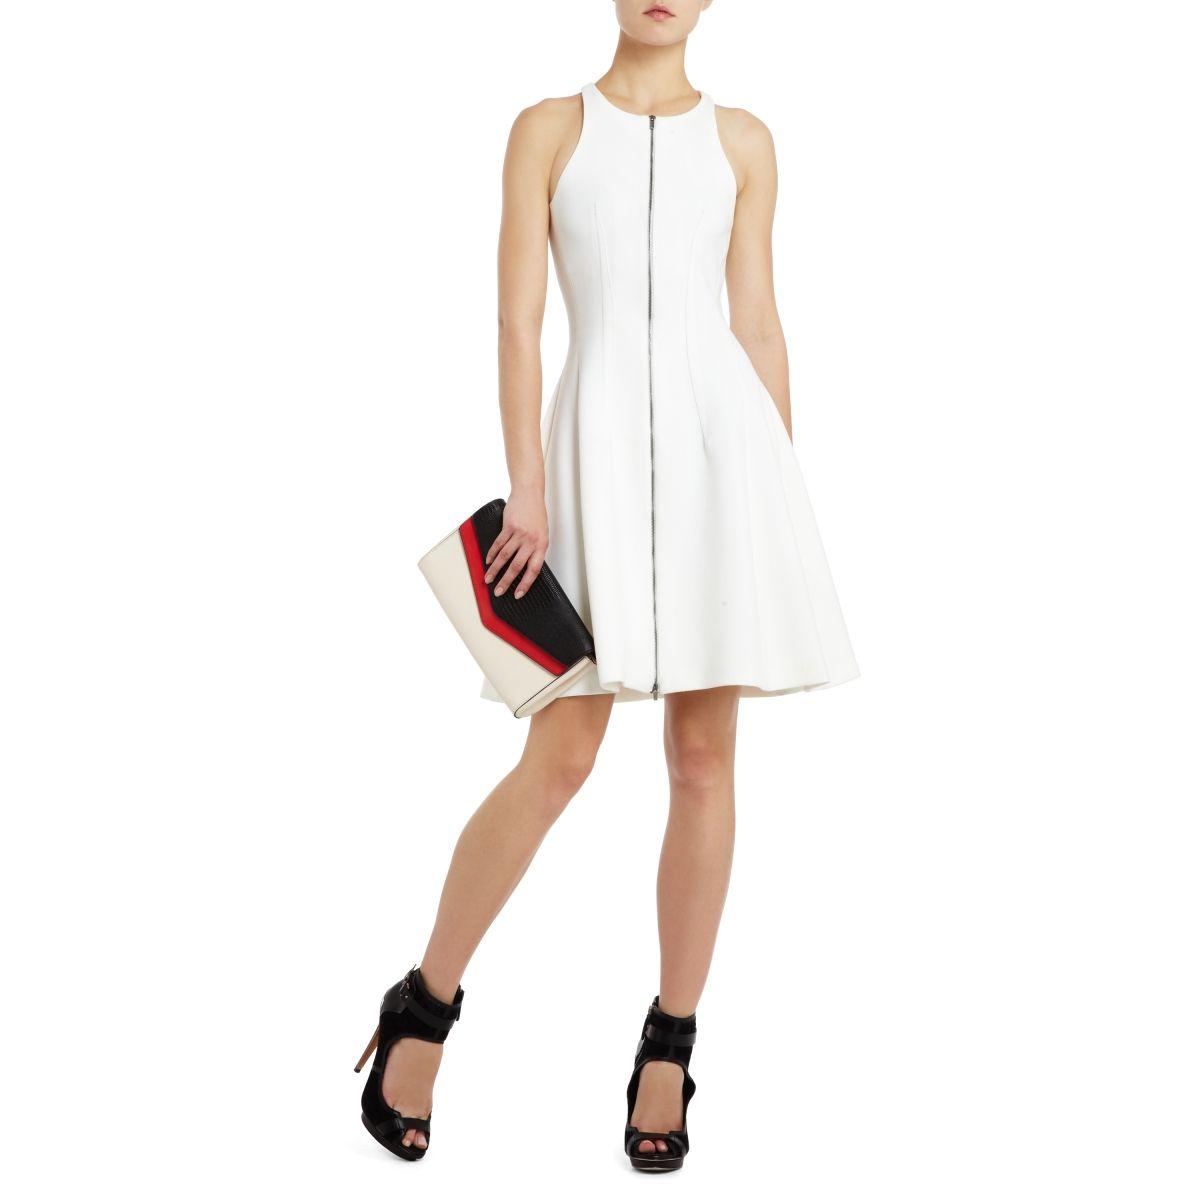 Giulianna Tulip Dress Dresses Bcbg Dresses Tulip Dress [ 1200 x 1200 Pixel ]